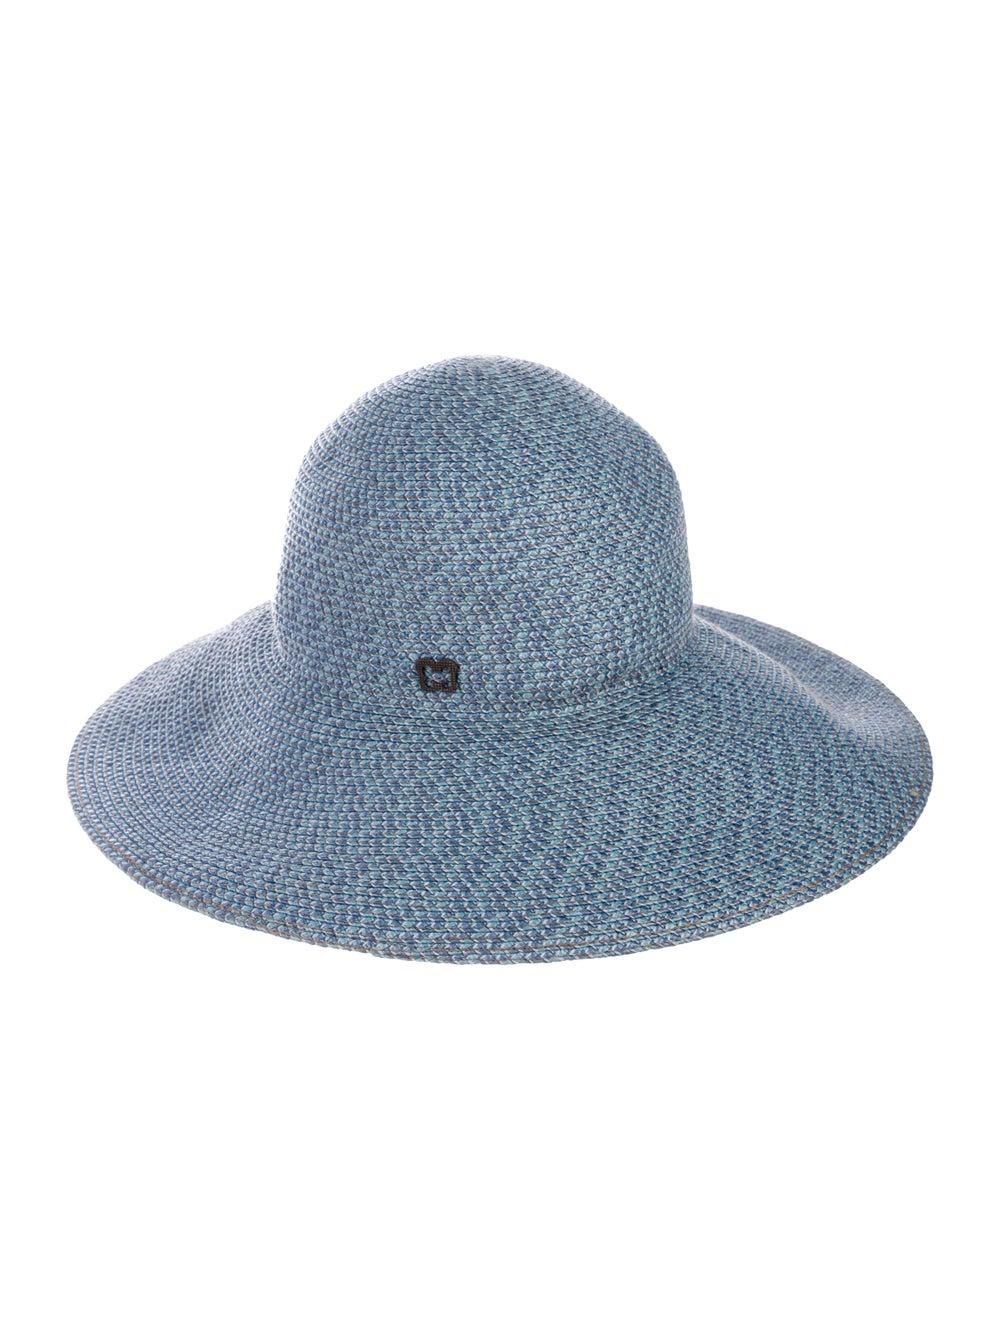 Eric Javits Straw Wide Brim Hat Blue - image 2